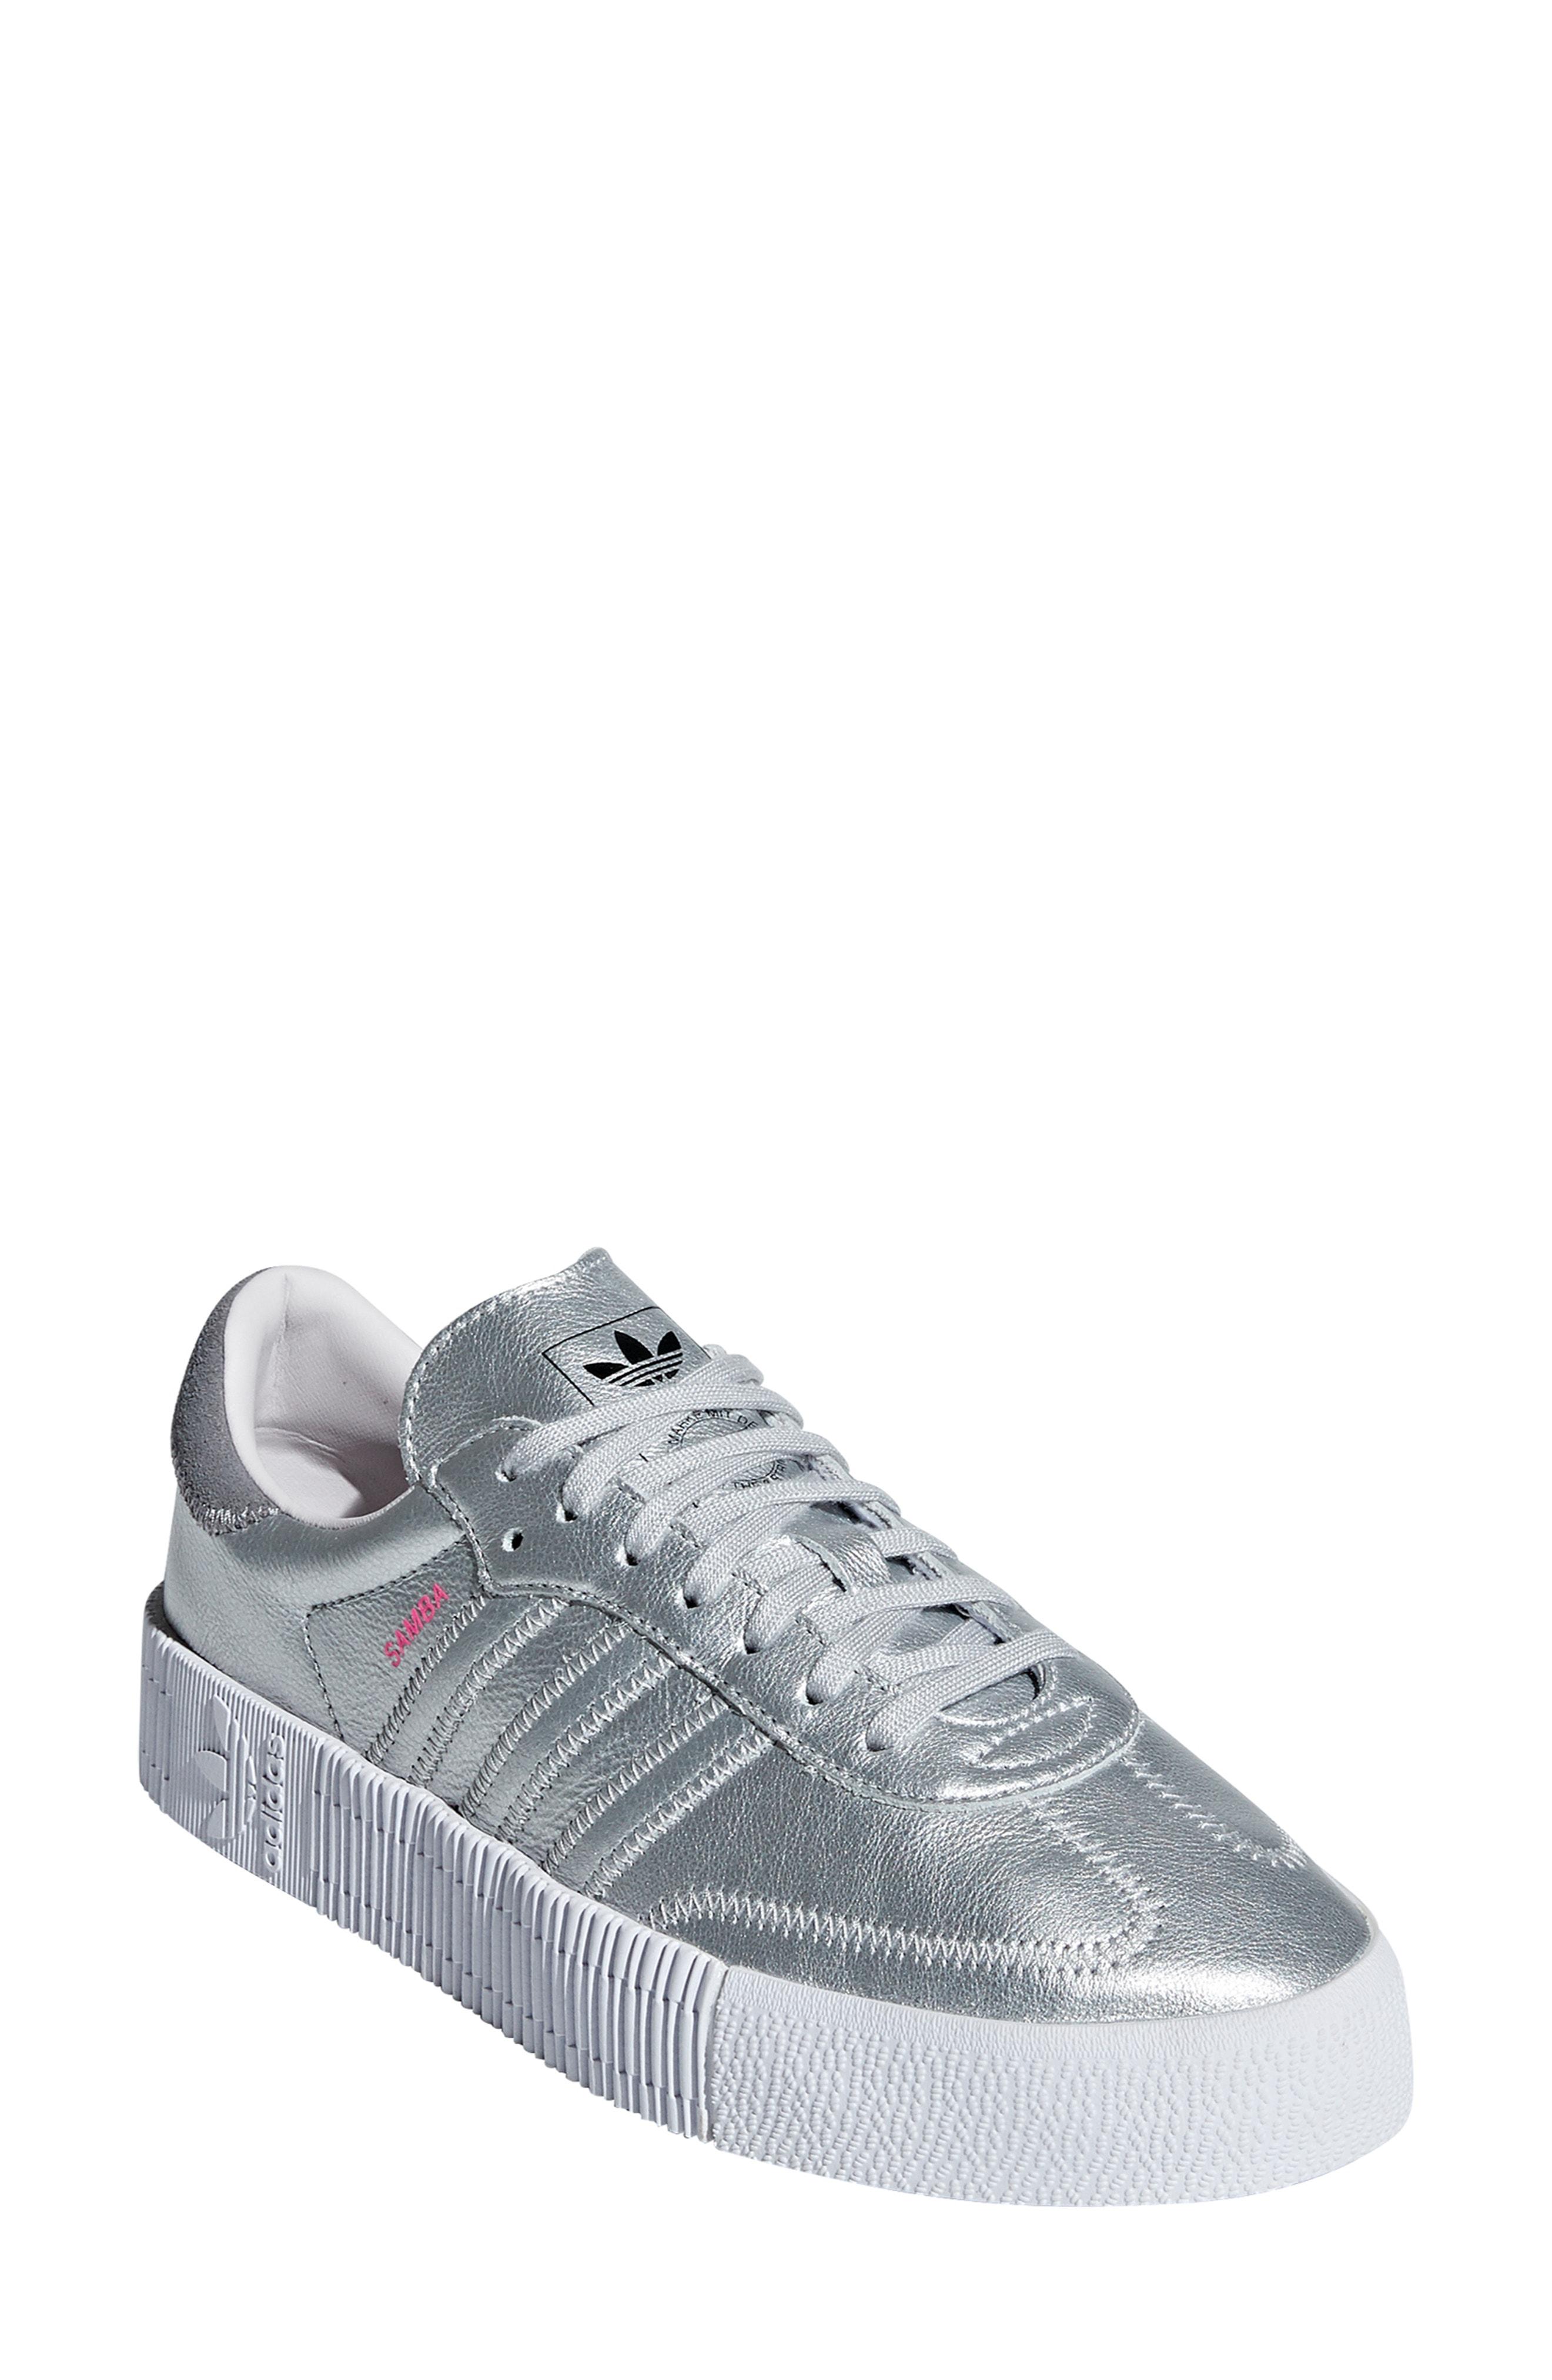 Adidas Originals Samba Rose Sneaker In Silver Metallic  Orchid Tint ... b44731284